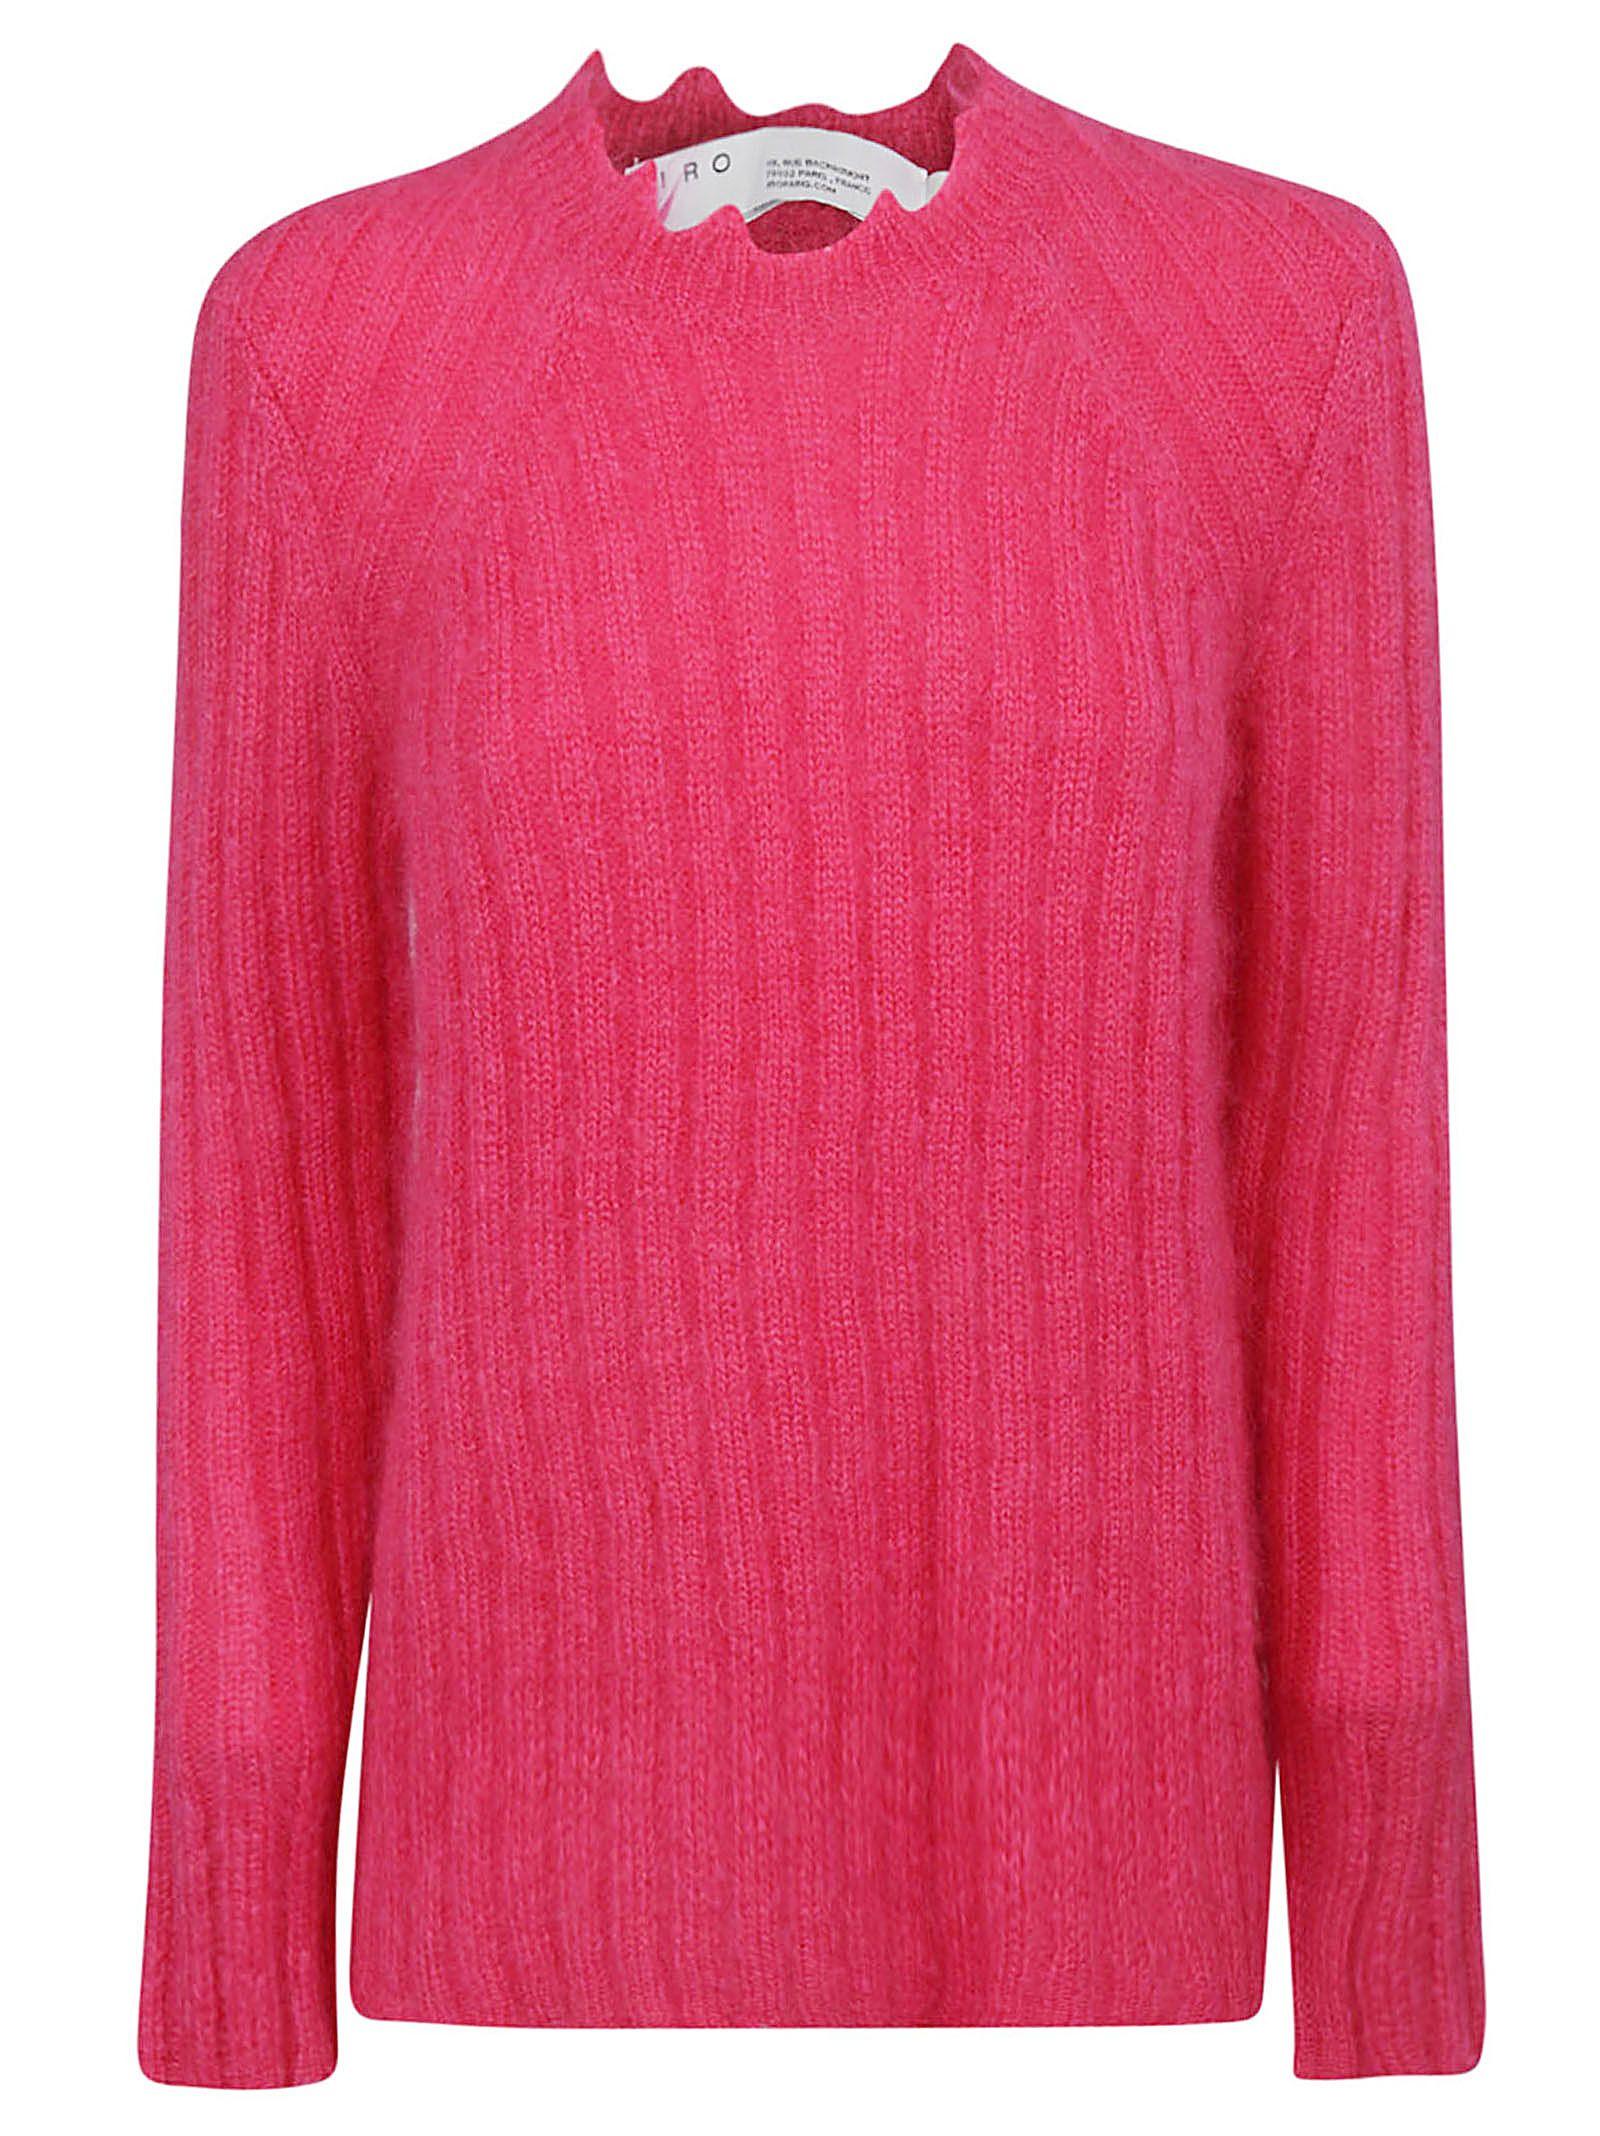 Iro Distressed Sweater